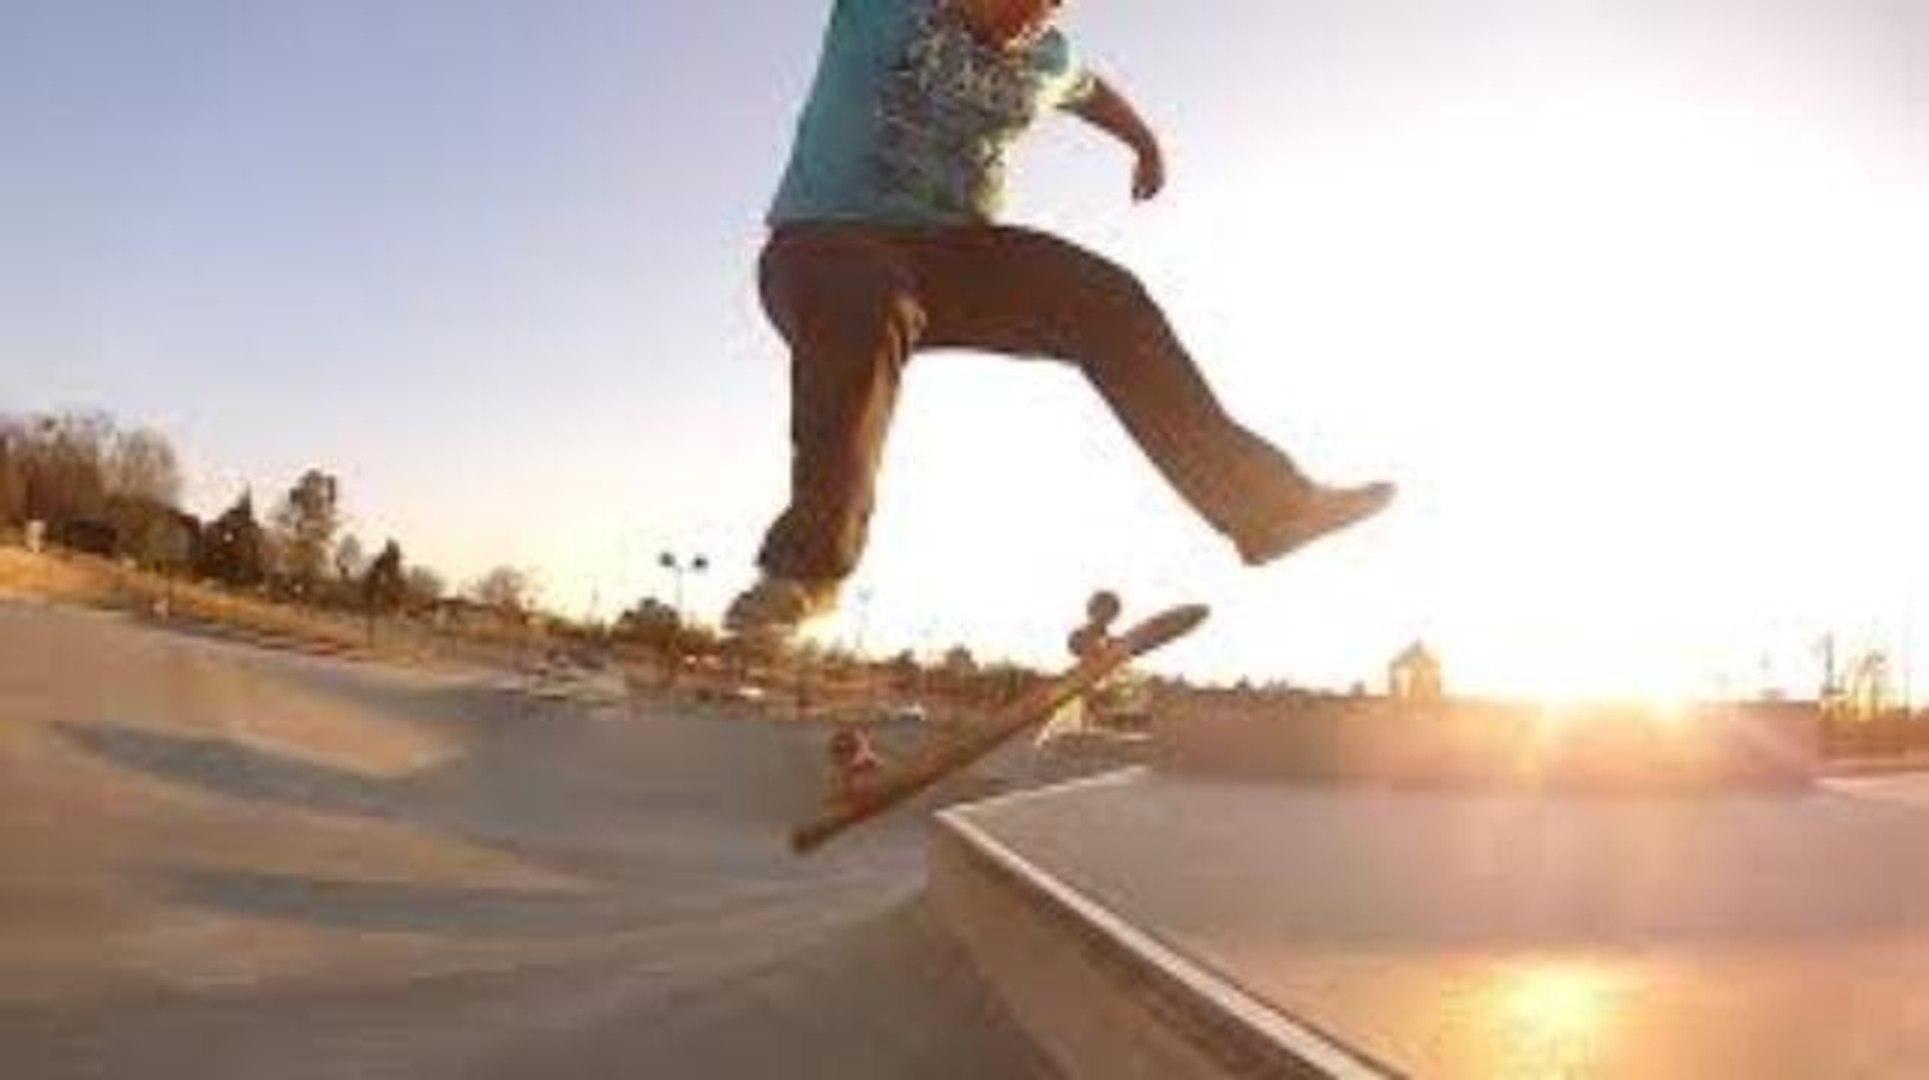 330lb Fat Guy Skateboarding 360 Flip Grinds Tricks Video Dailymotion